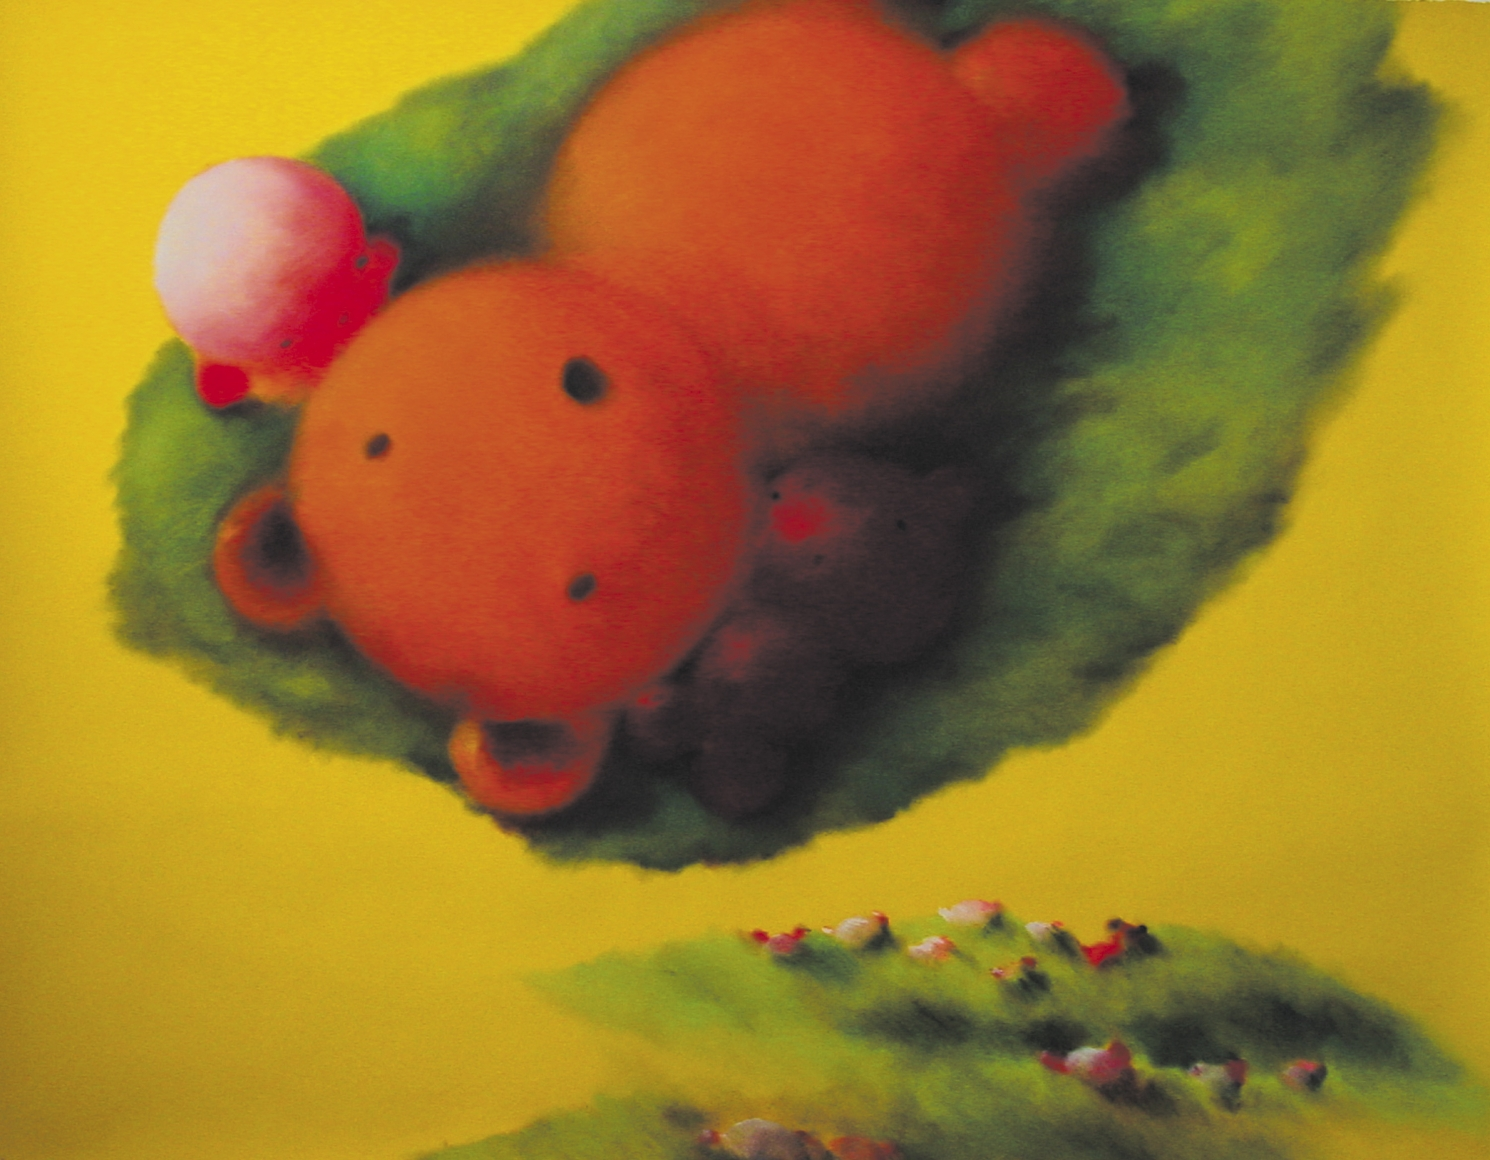 MIE YIM, The Ambush, 2004